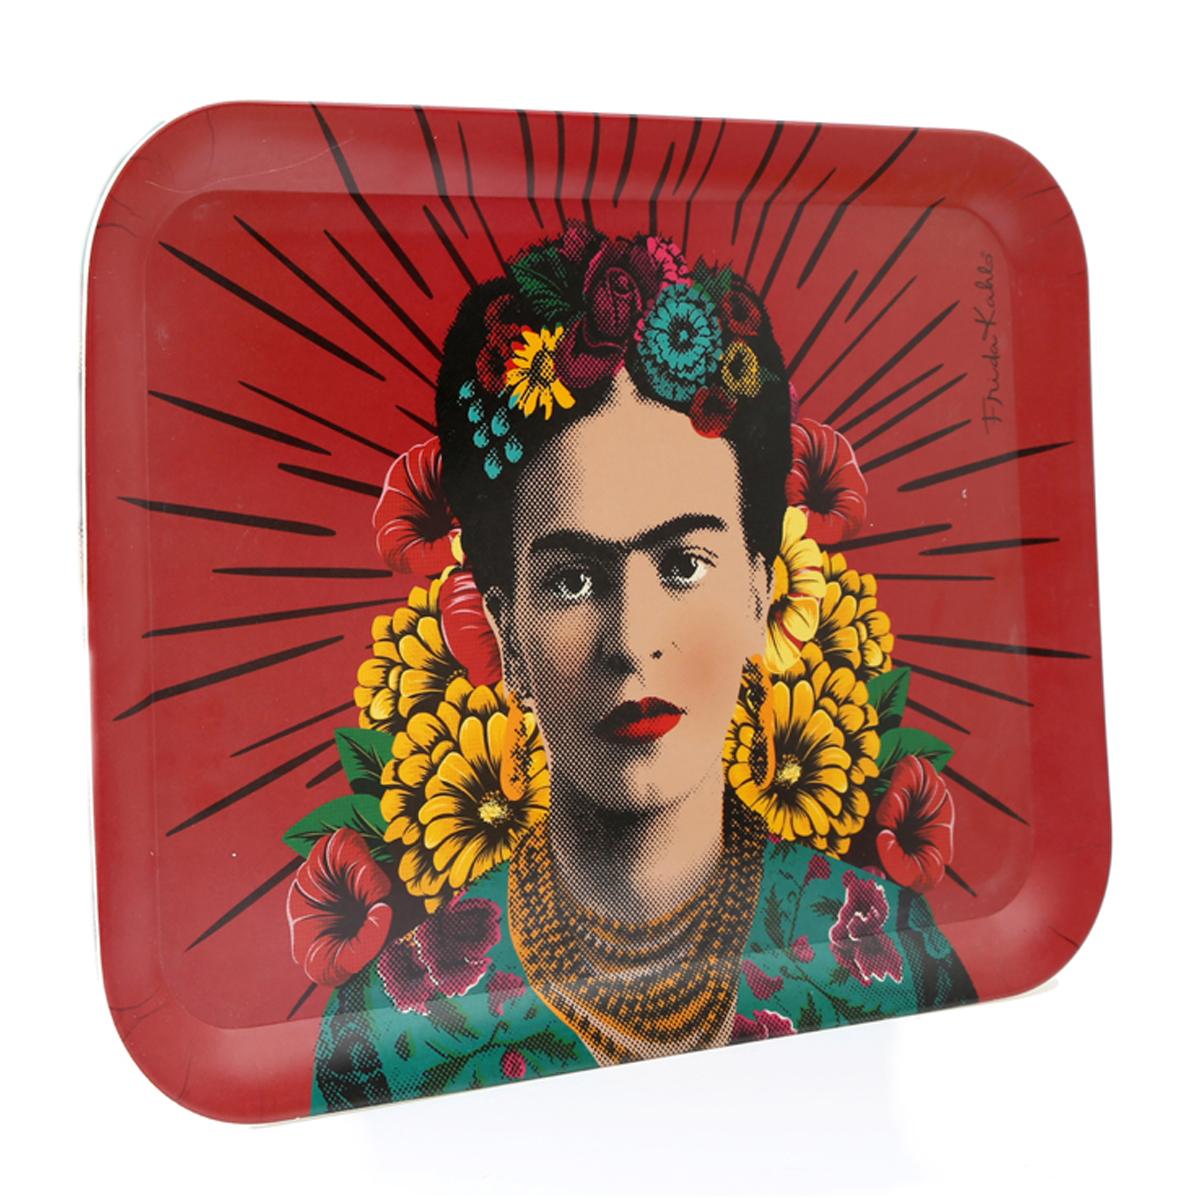 Grand plateau bambou \'Frida Kahlo\' rouge - 43x32 cm - [A1403]